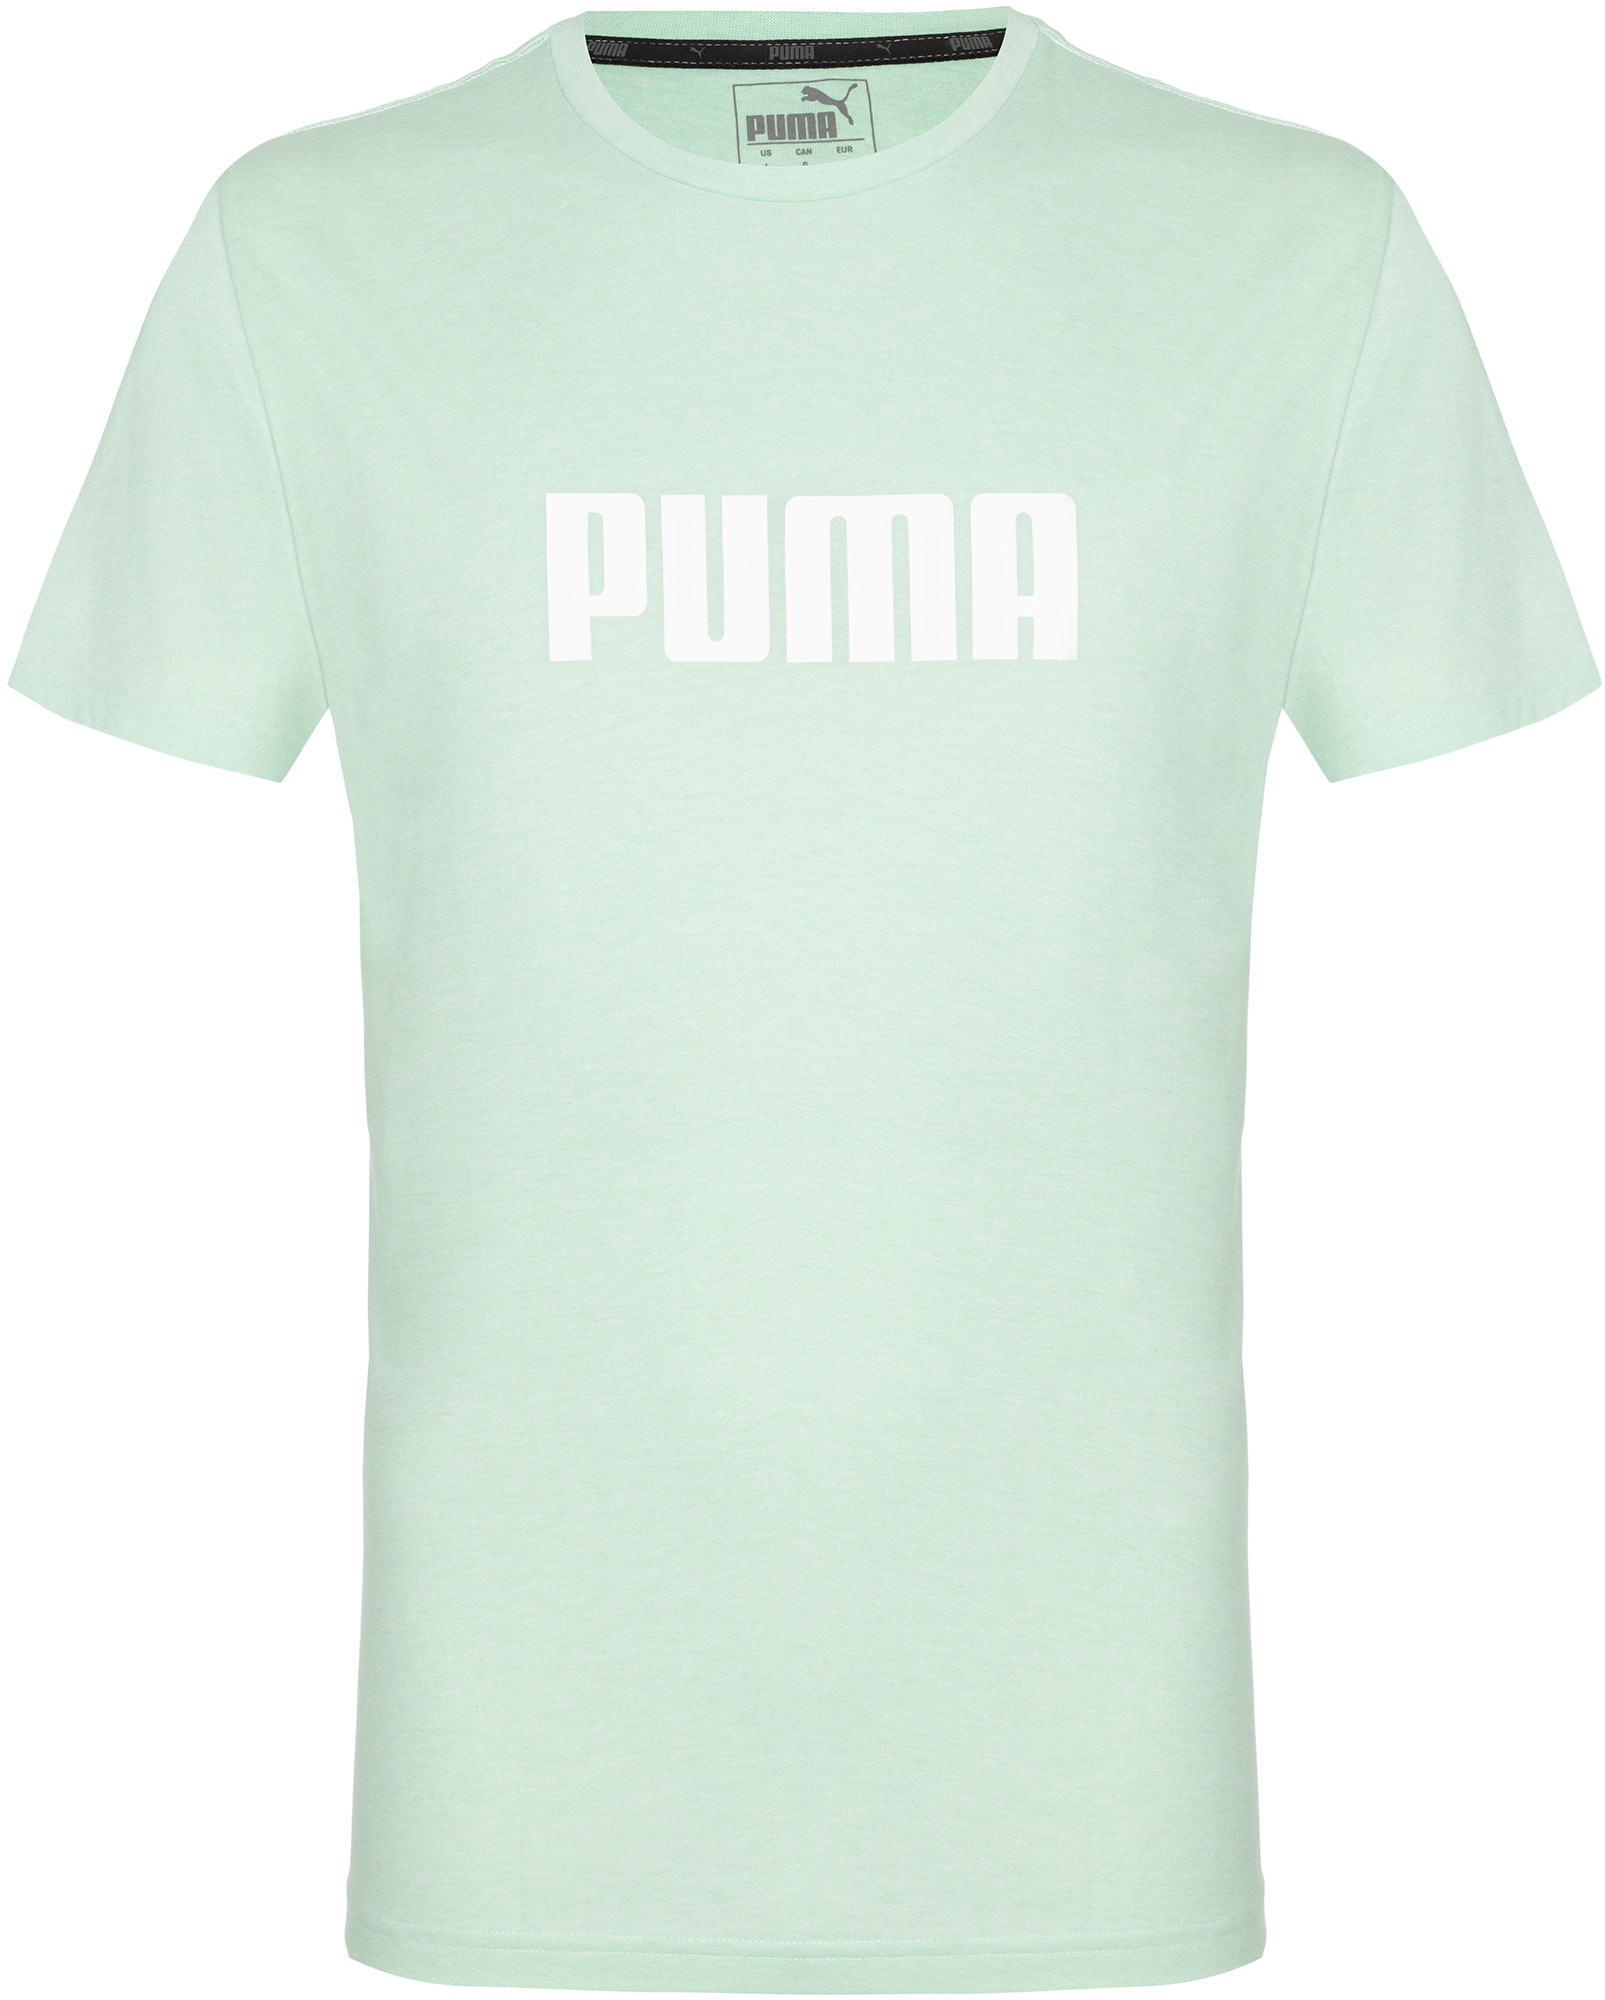 Puma Футболка мужская Puma ESS+ Heather Tee, размер 52-54 men ombre tee with drawstring shorts